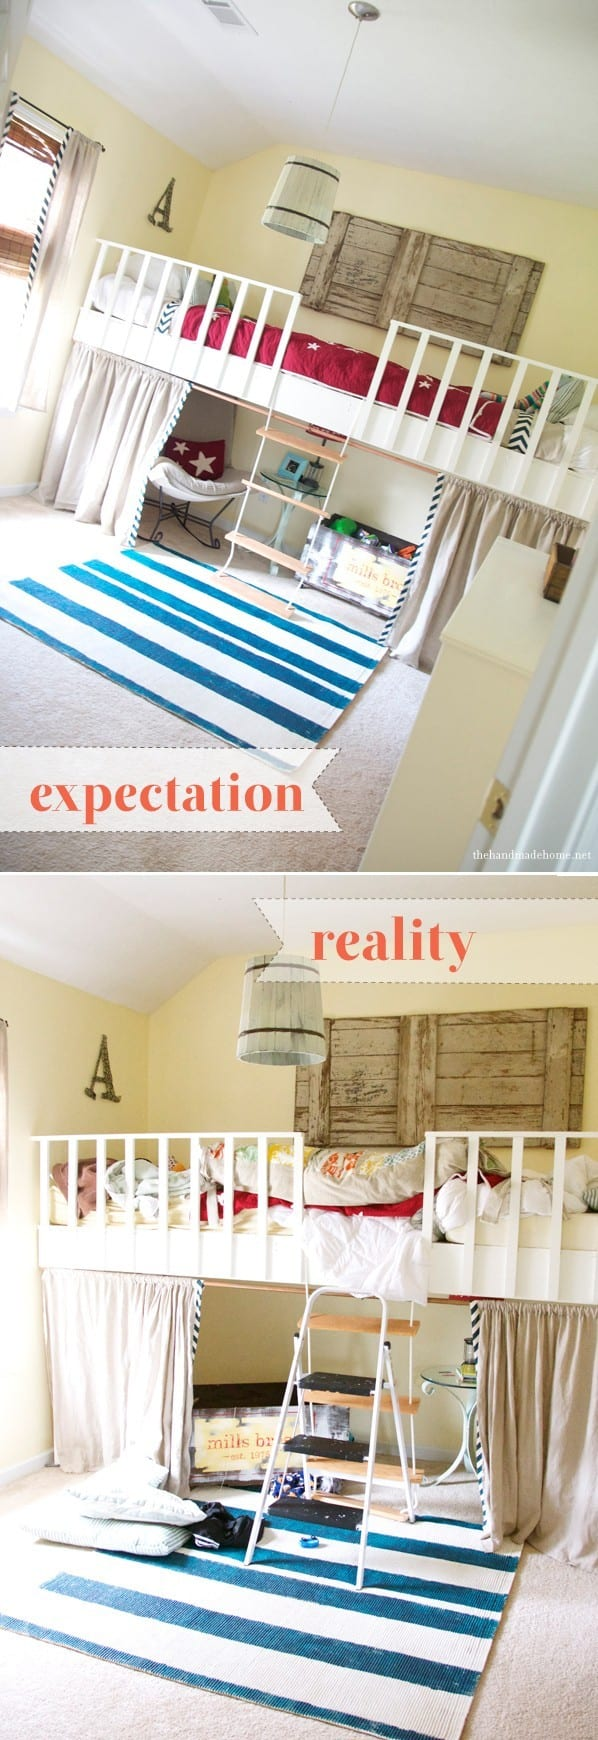 boys_room_expectations